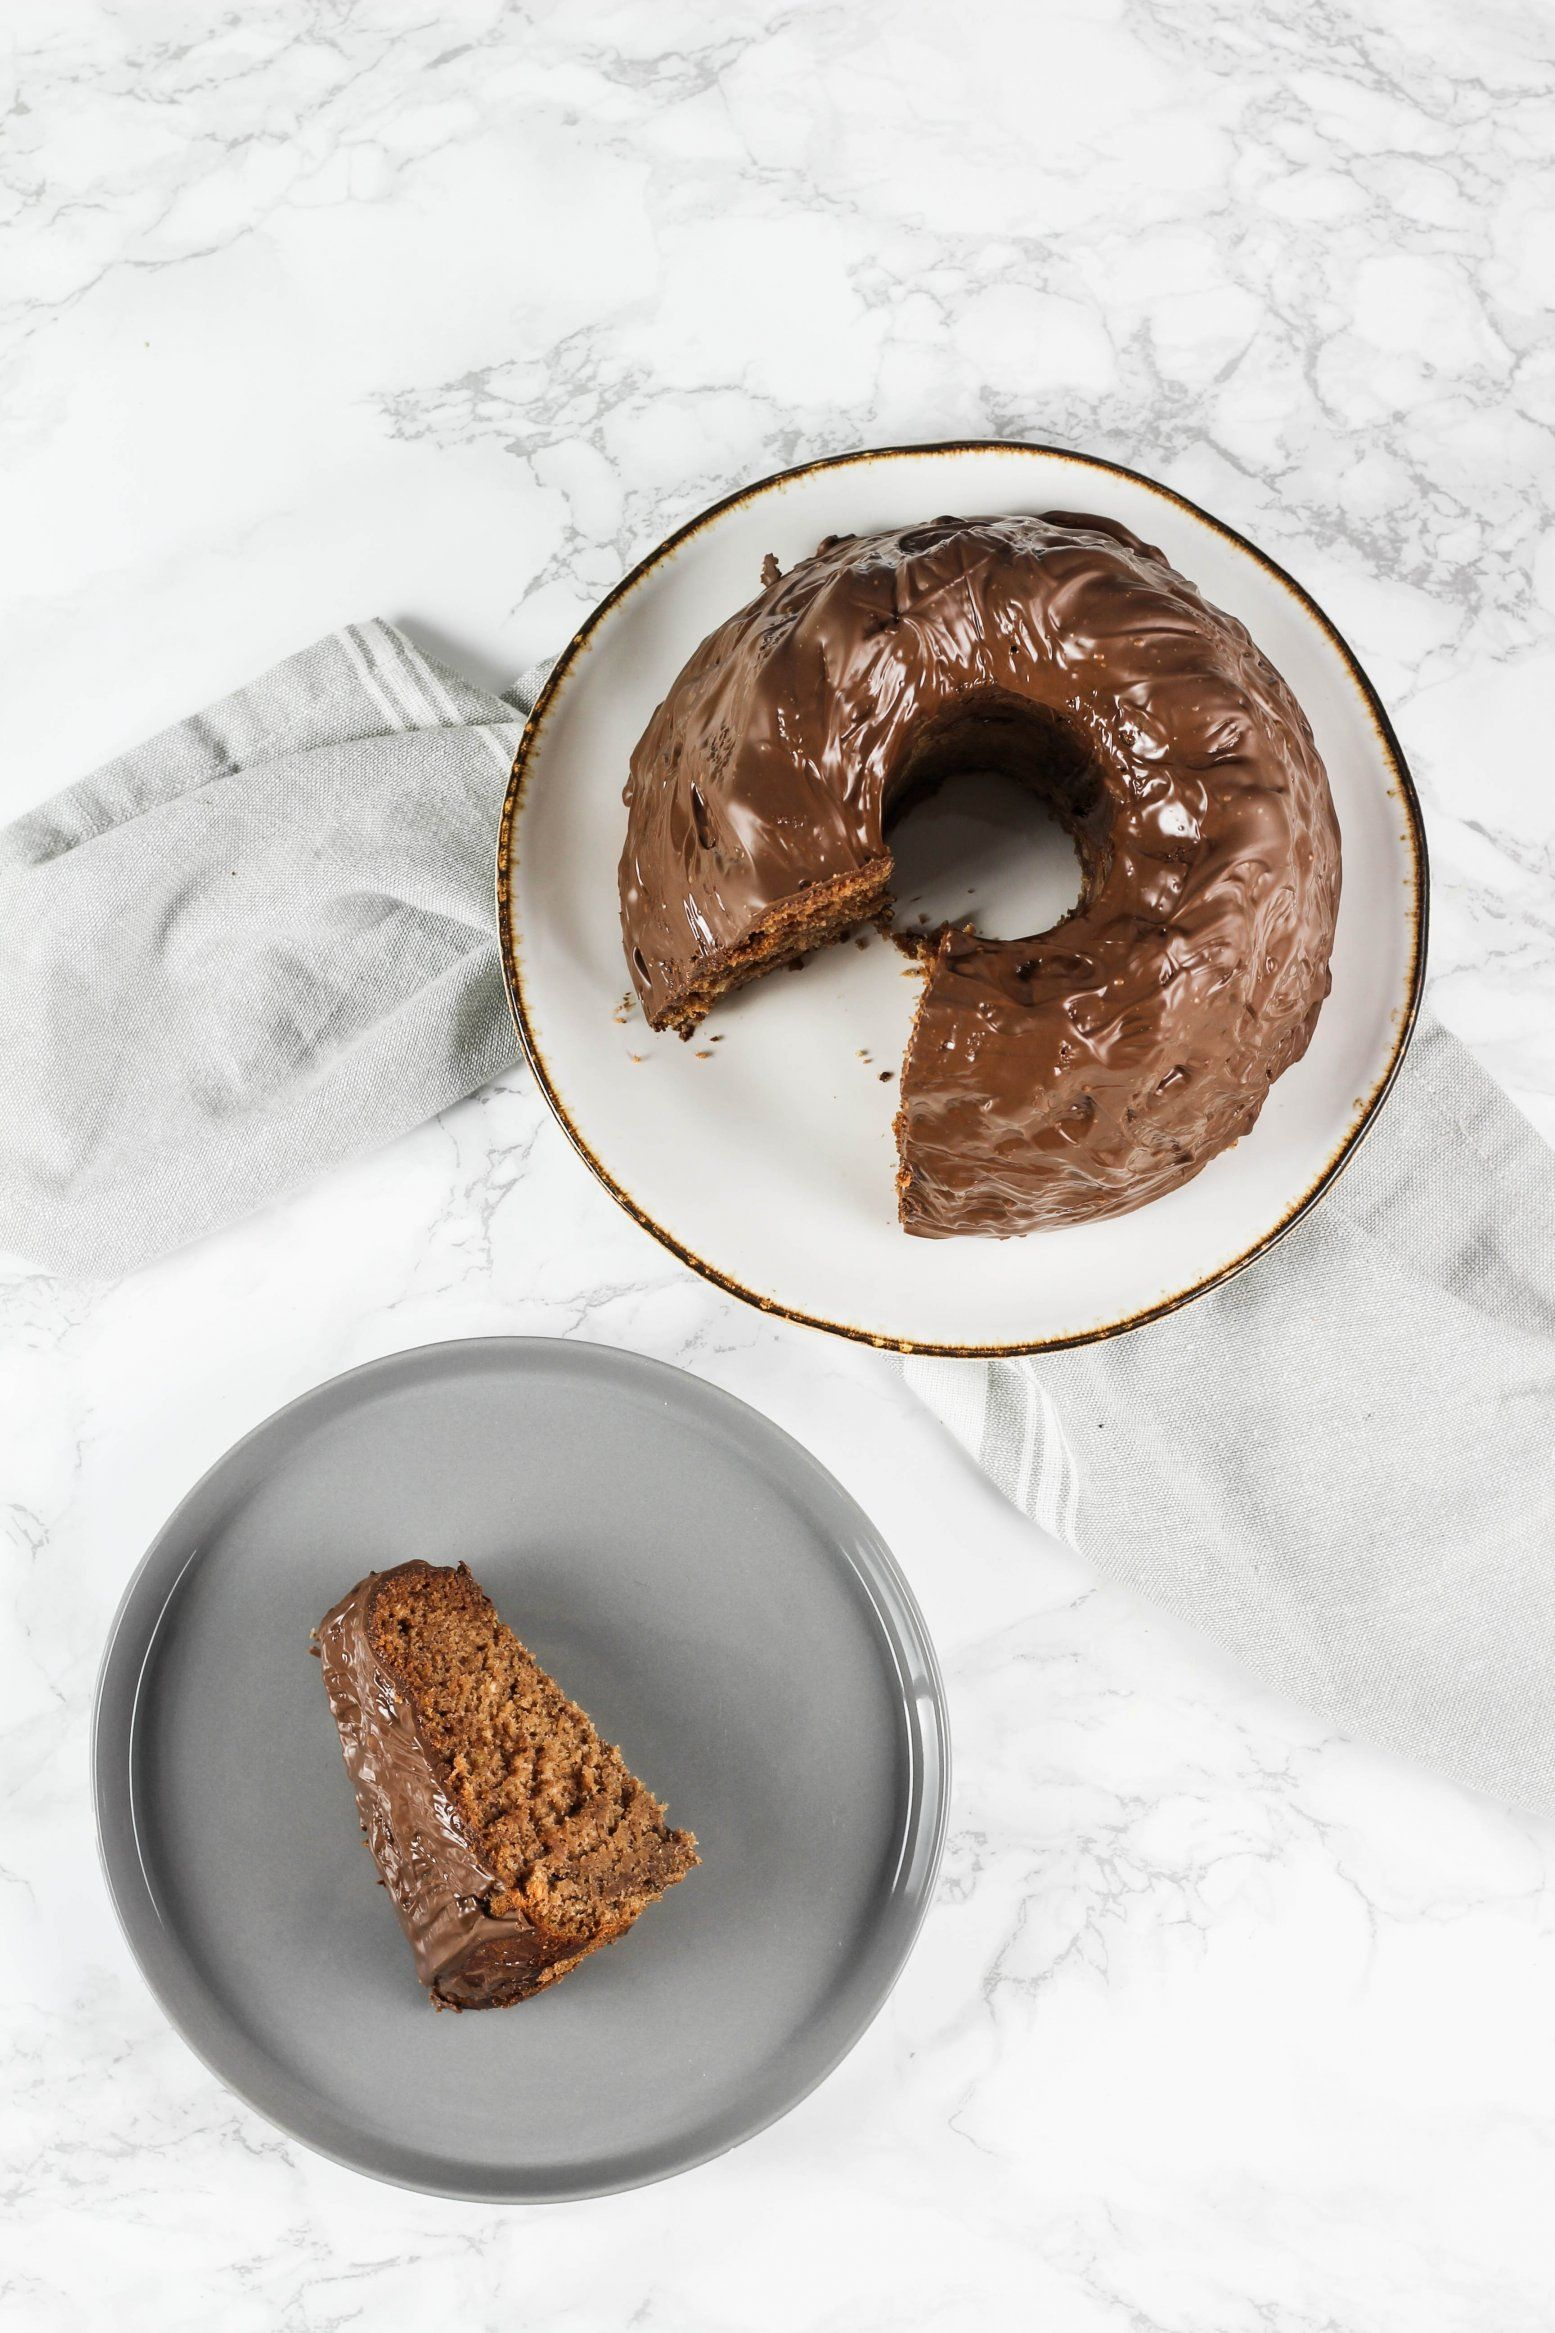 mega saftiger veganer schokoladen bananenkuchen vegan baking. Black Bedroom Furniture Sets. Home Design Ideas